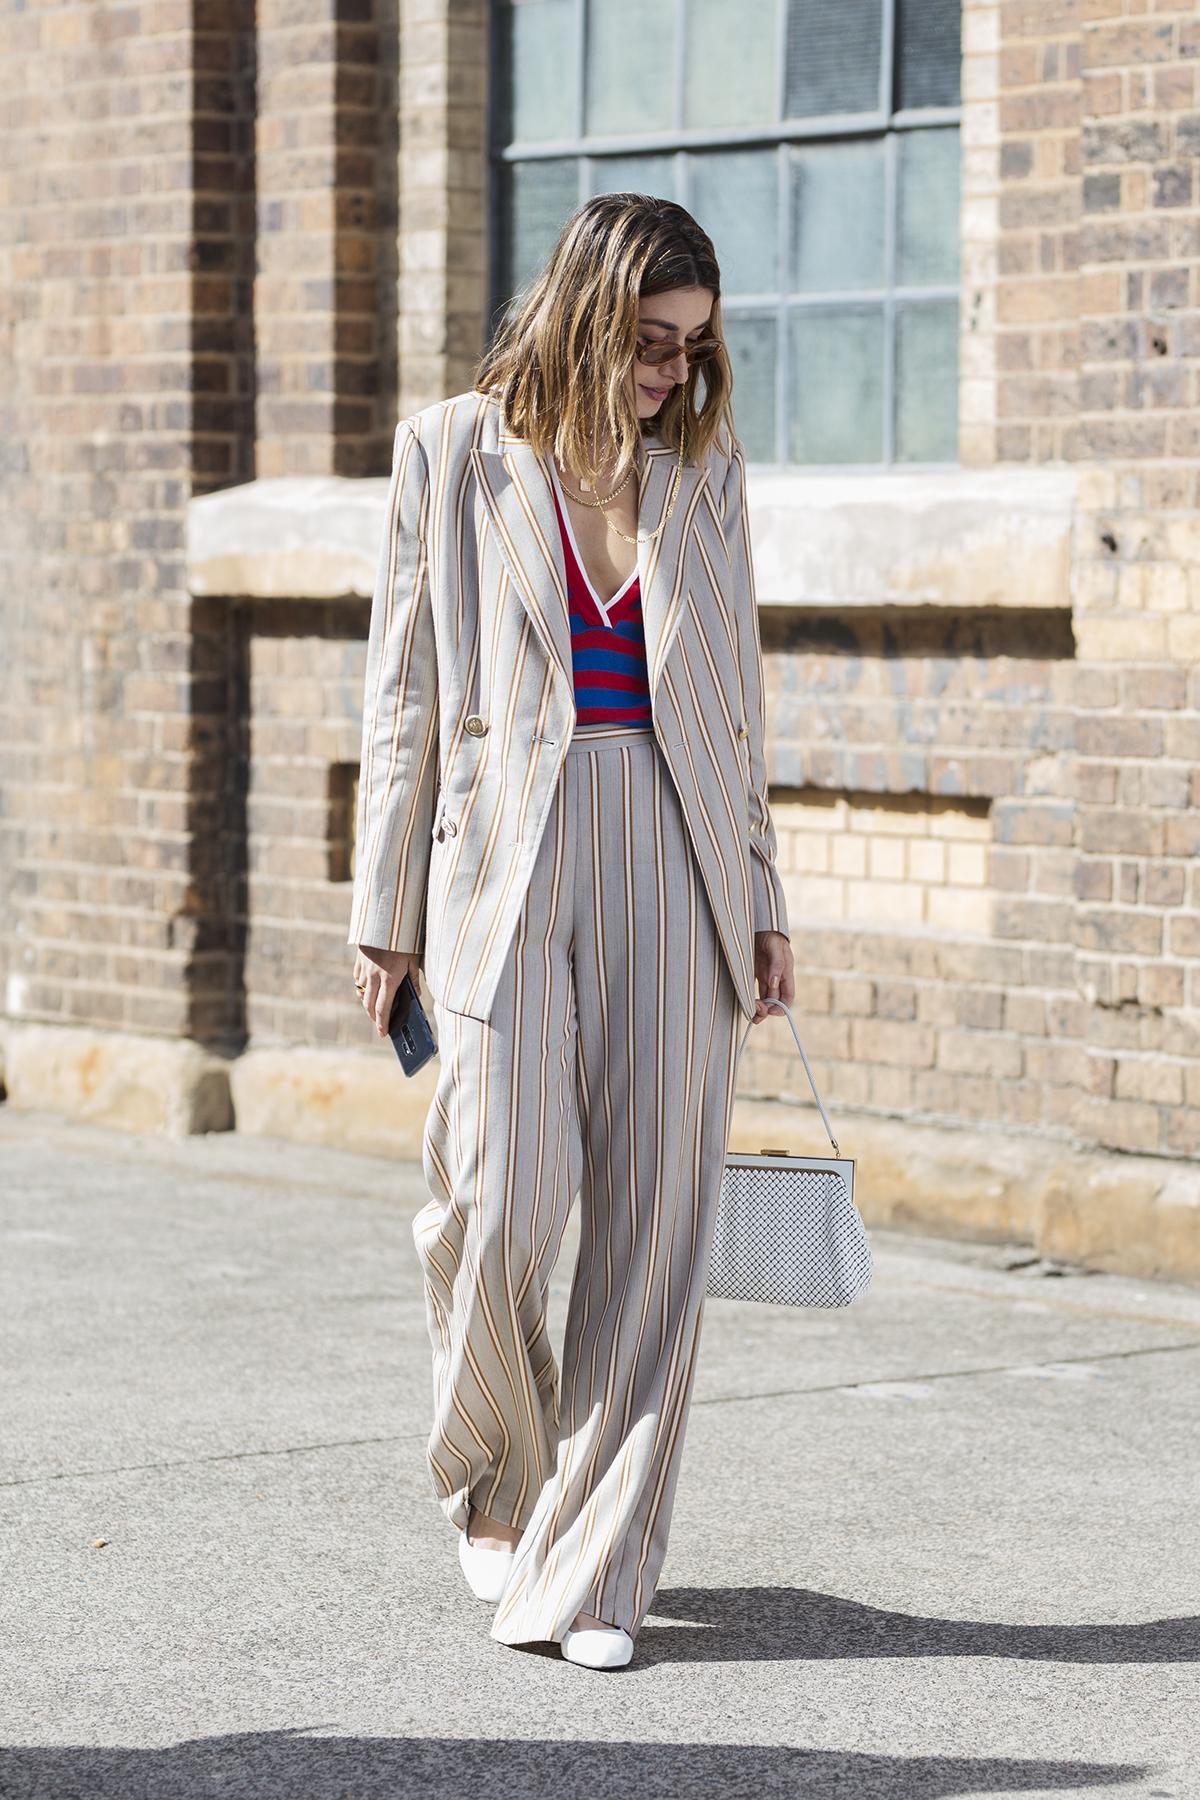 Carmen Hamilton 2 D2 MBFWA 2018 Stylesnooperdan Street Style.jpg